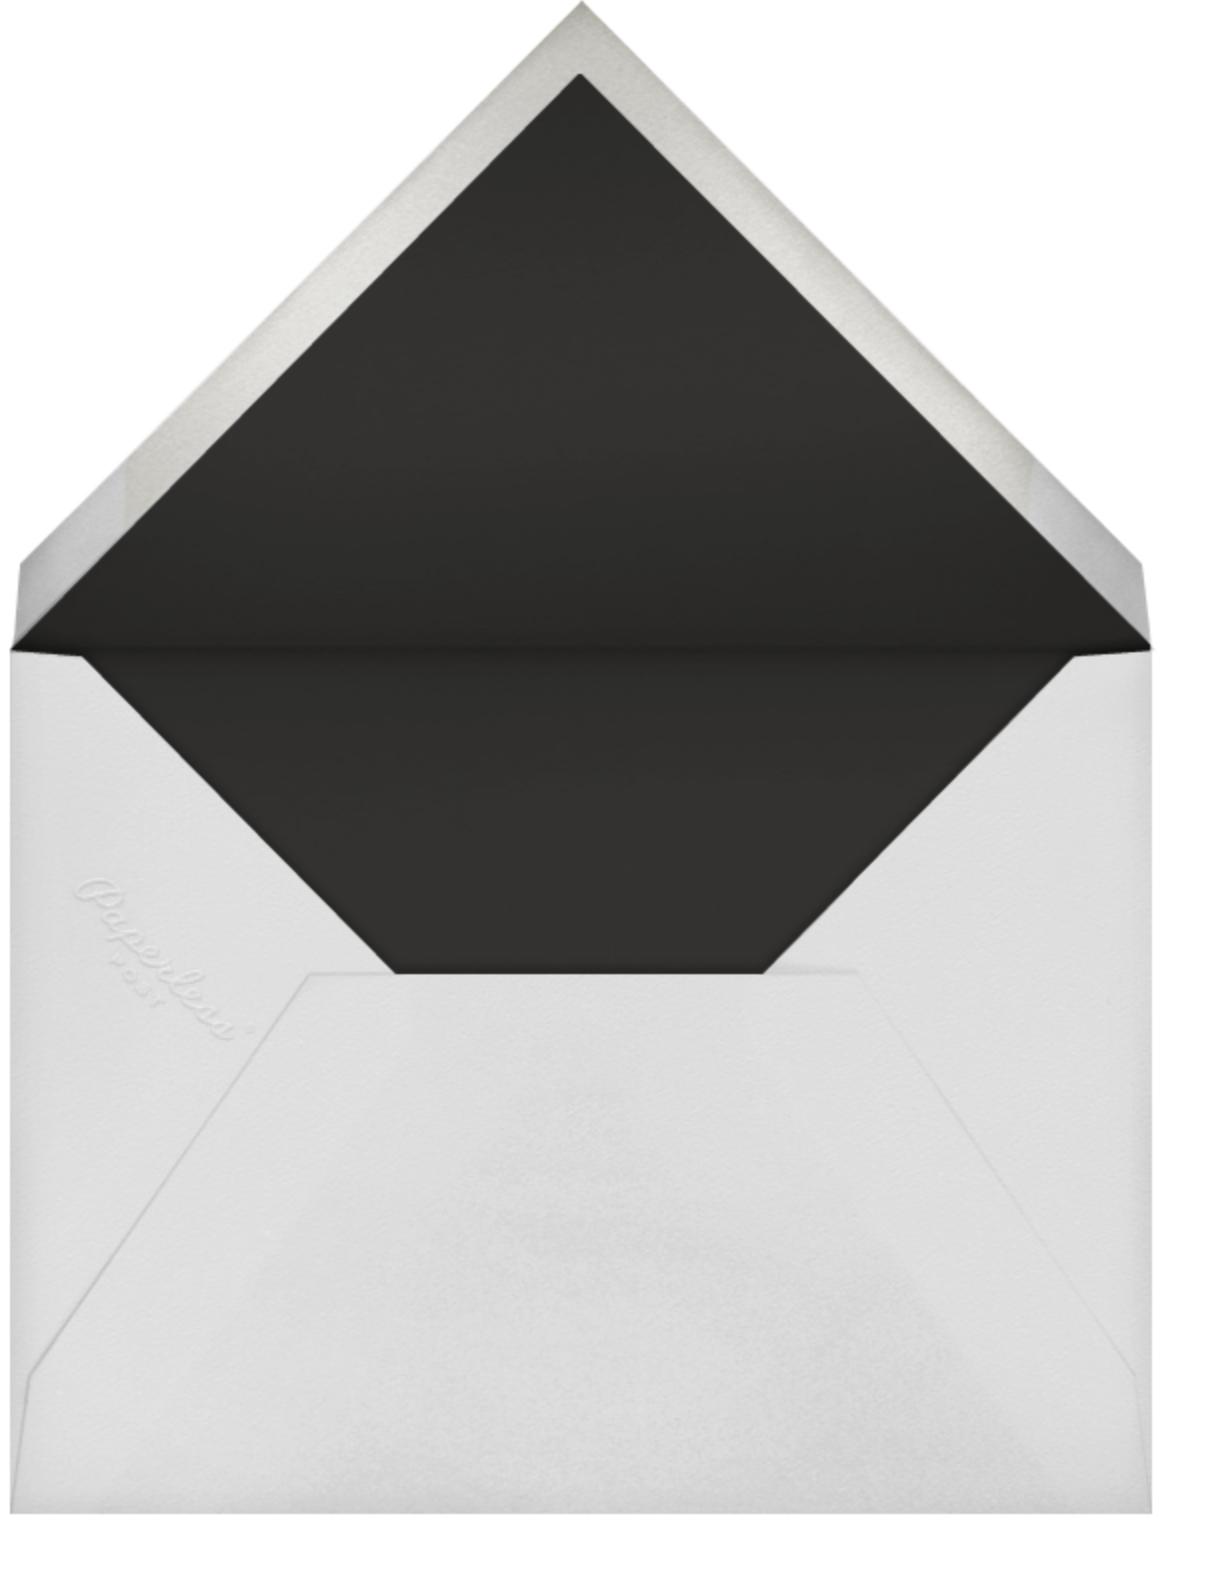 Richmond Park (Save the Date) - White/Silver - Oscar de la Renta - Party save the dates - envelope back